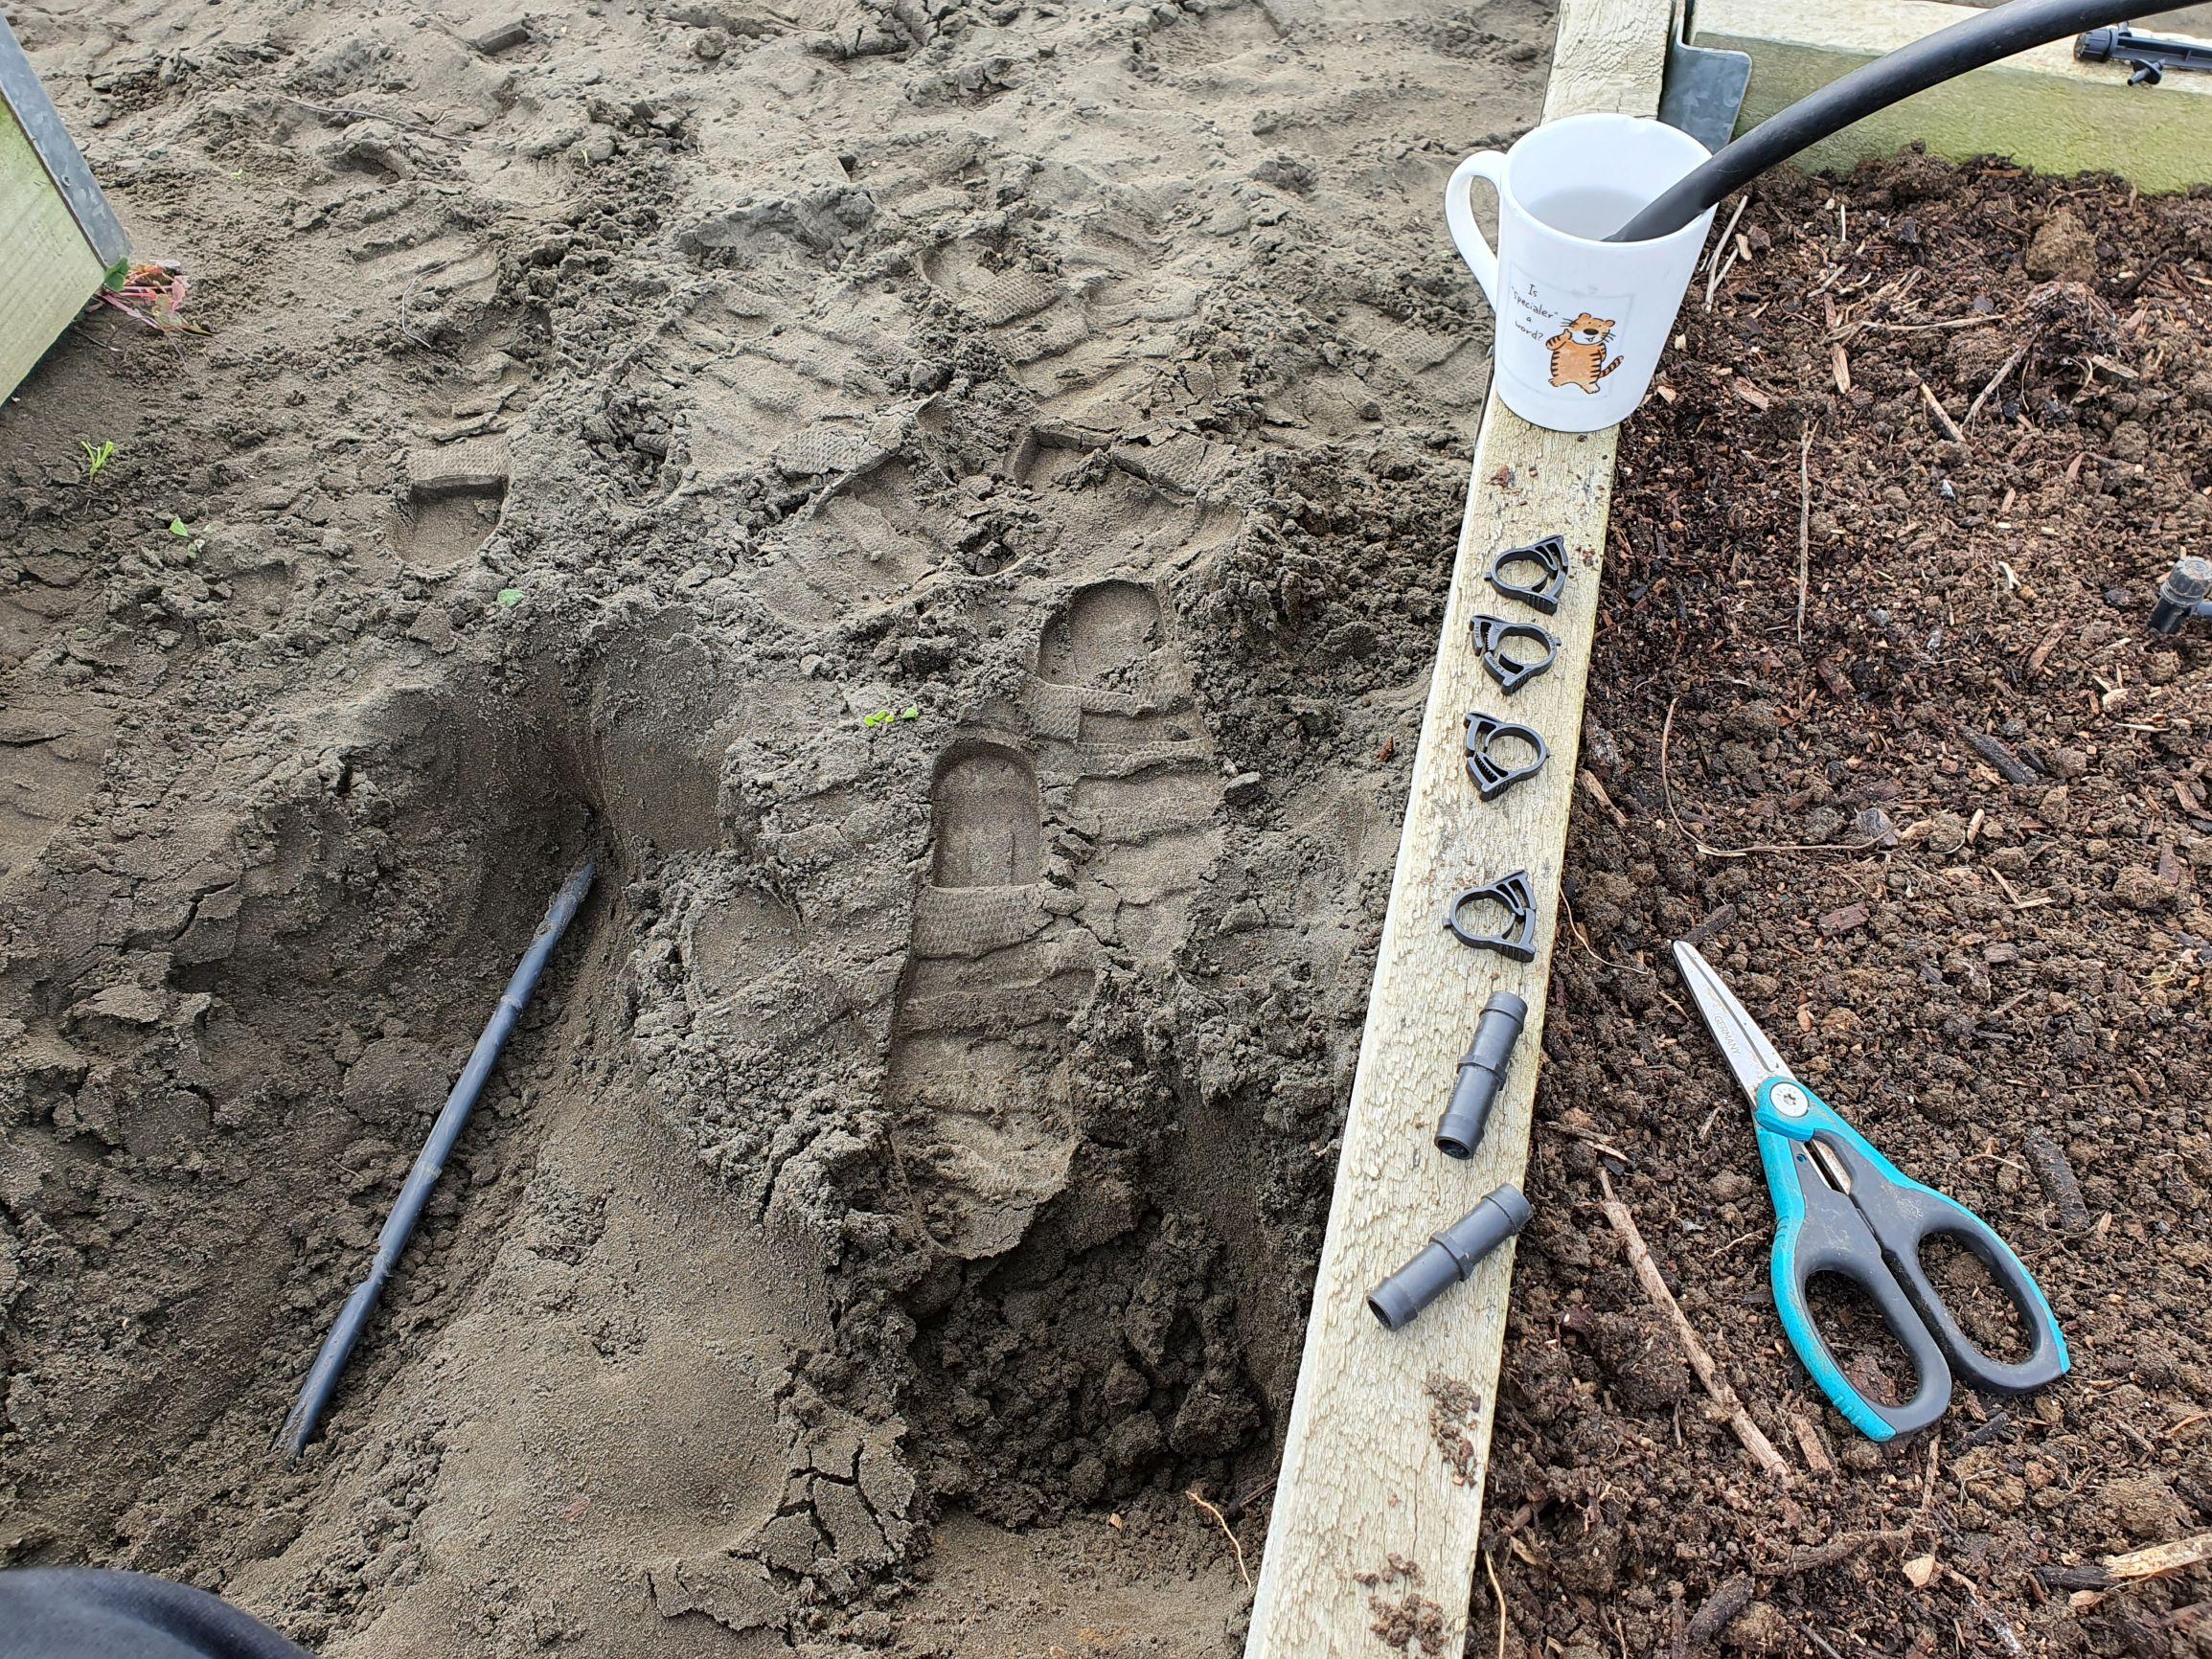 Fixing irrigation